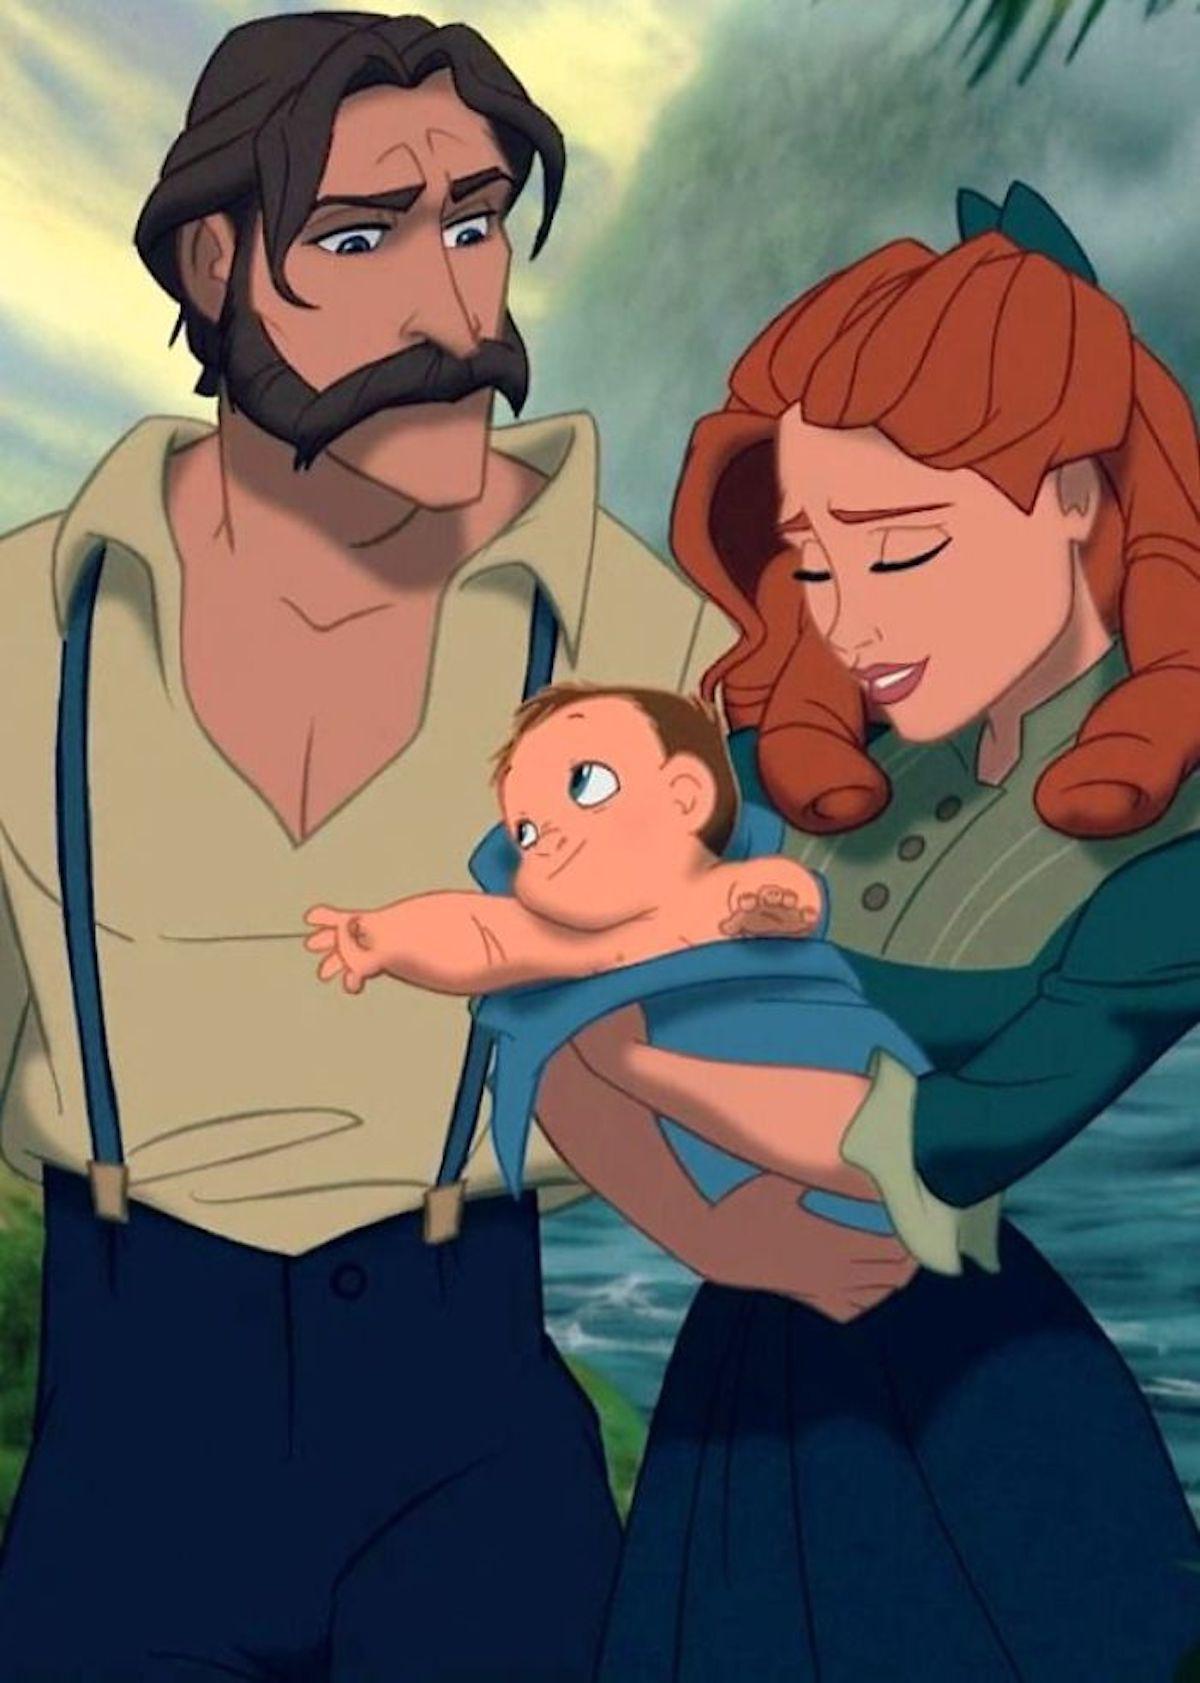 Illustrations John père de Tarzan Jirka Väätäinen